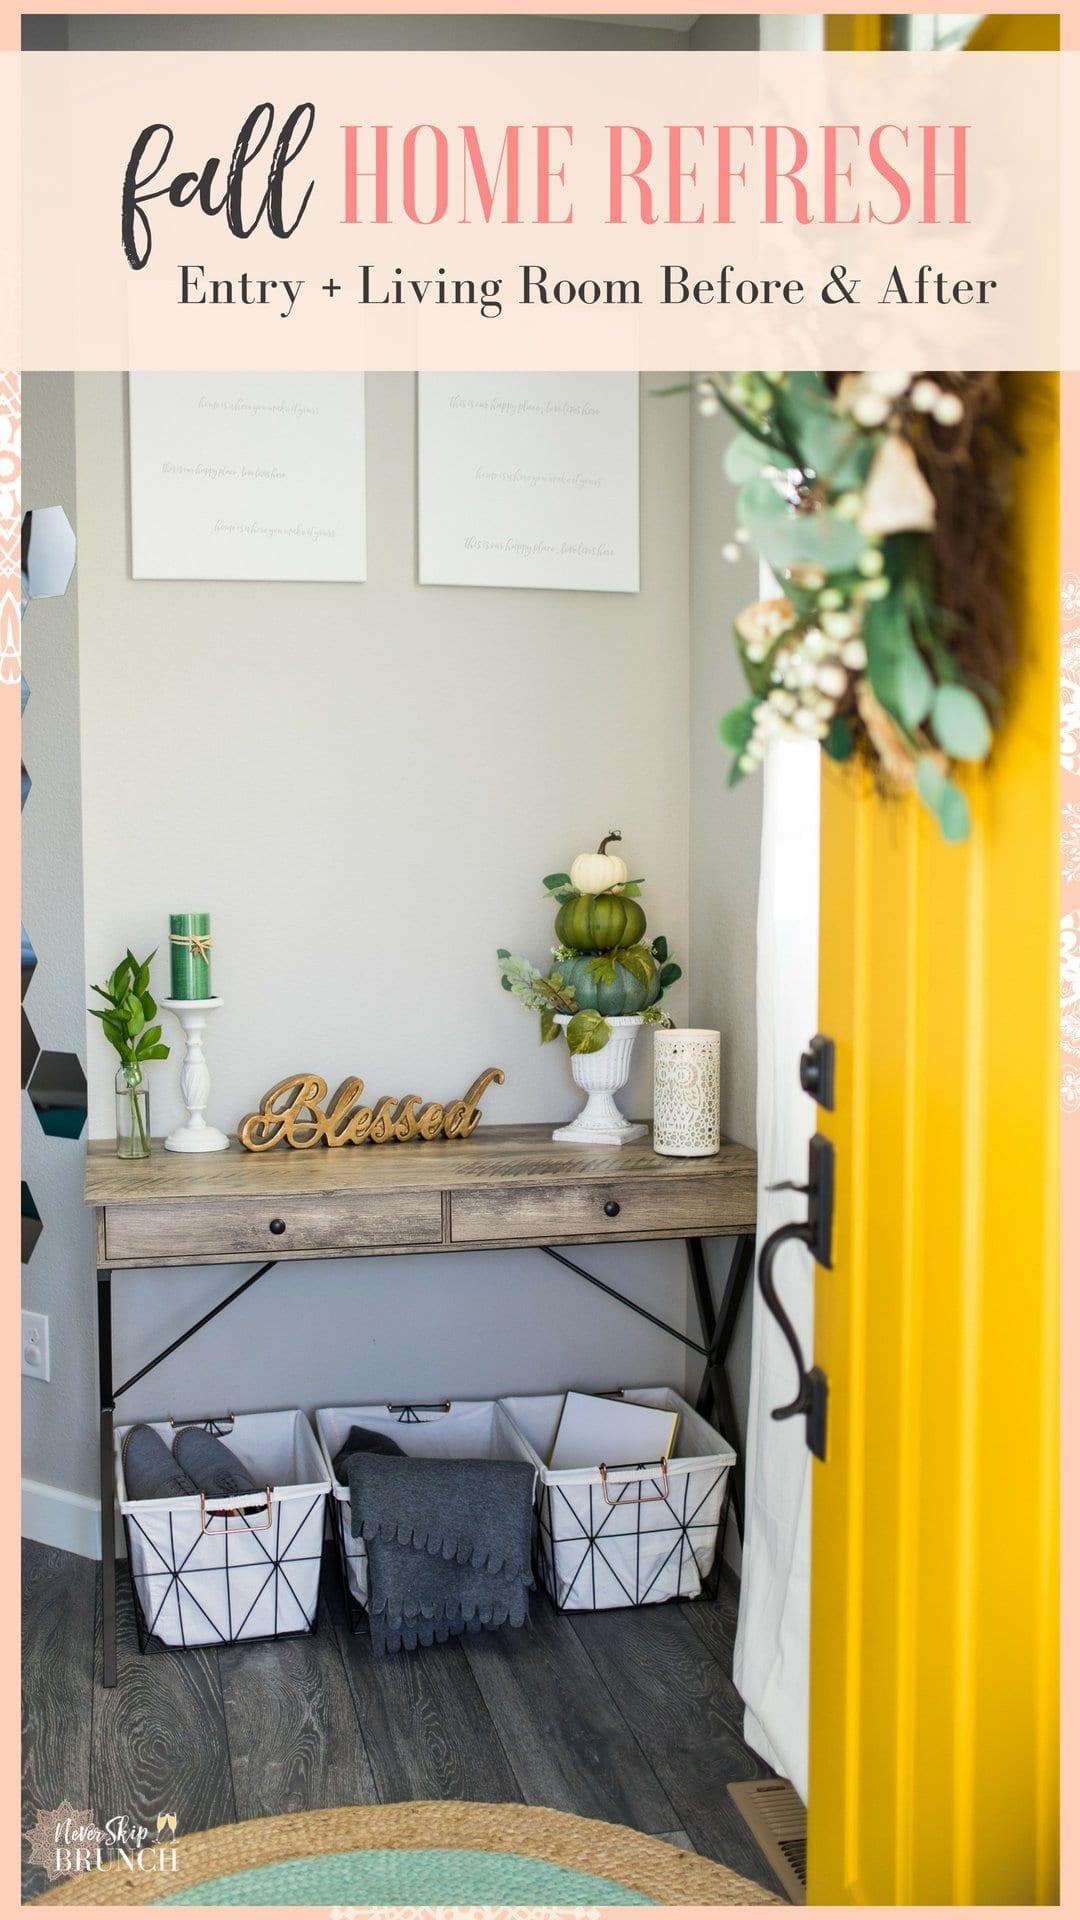 fall decor ideas | fall decor not orange | fall decor ideas for the home | fall decorations for home | never skip brunch by cara newhart #decor #fall #neverskipbrunch